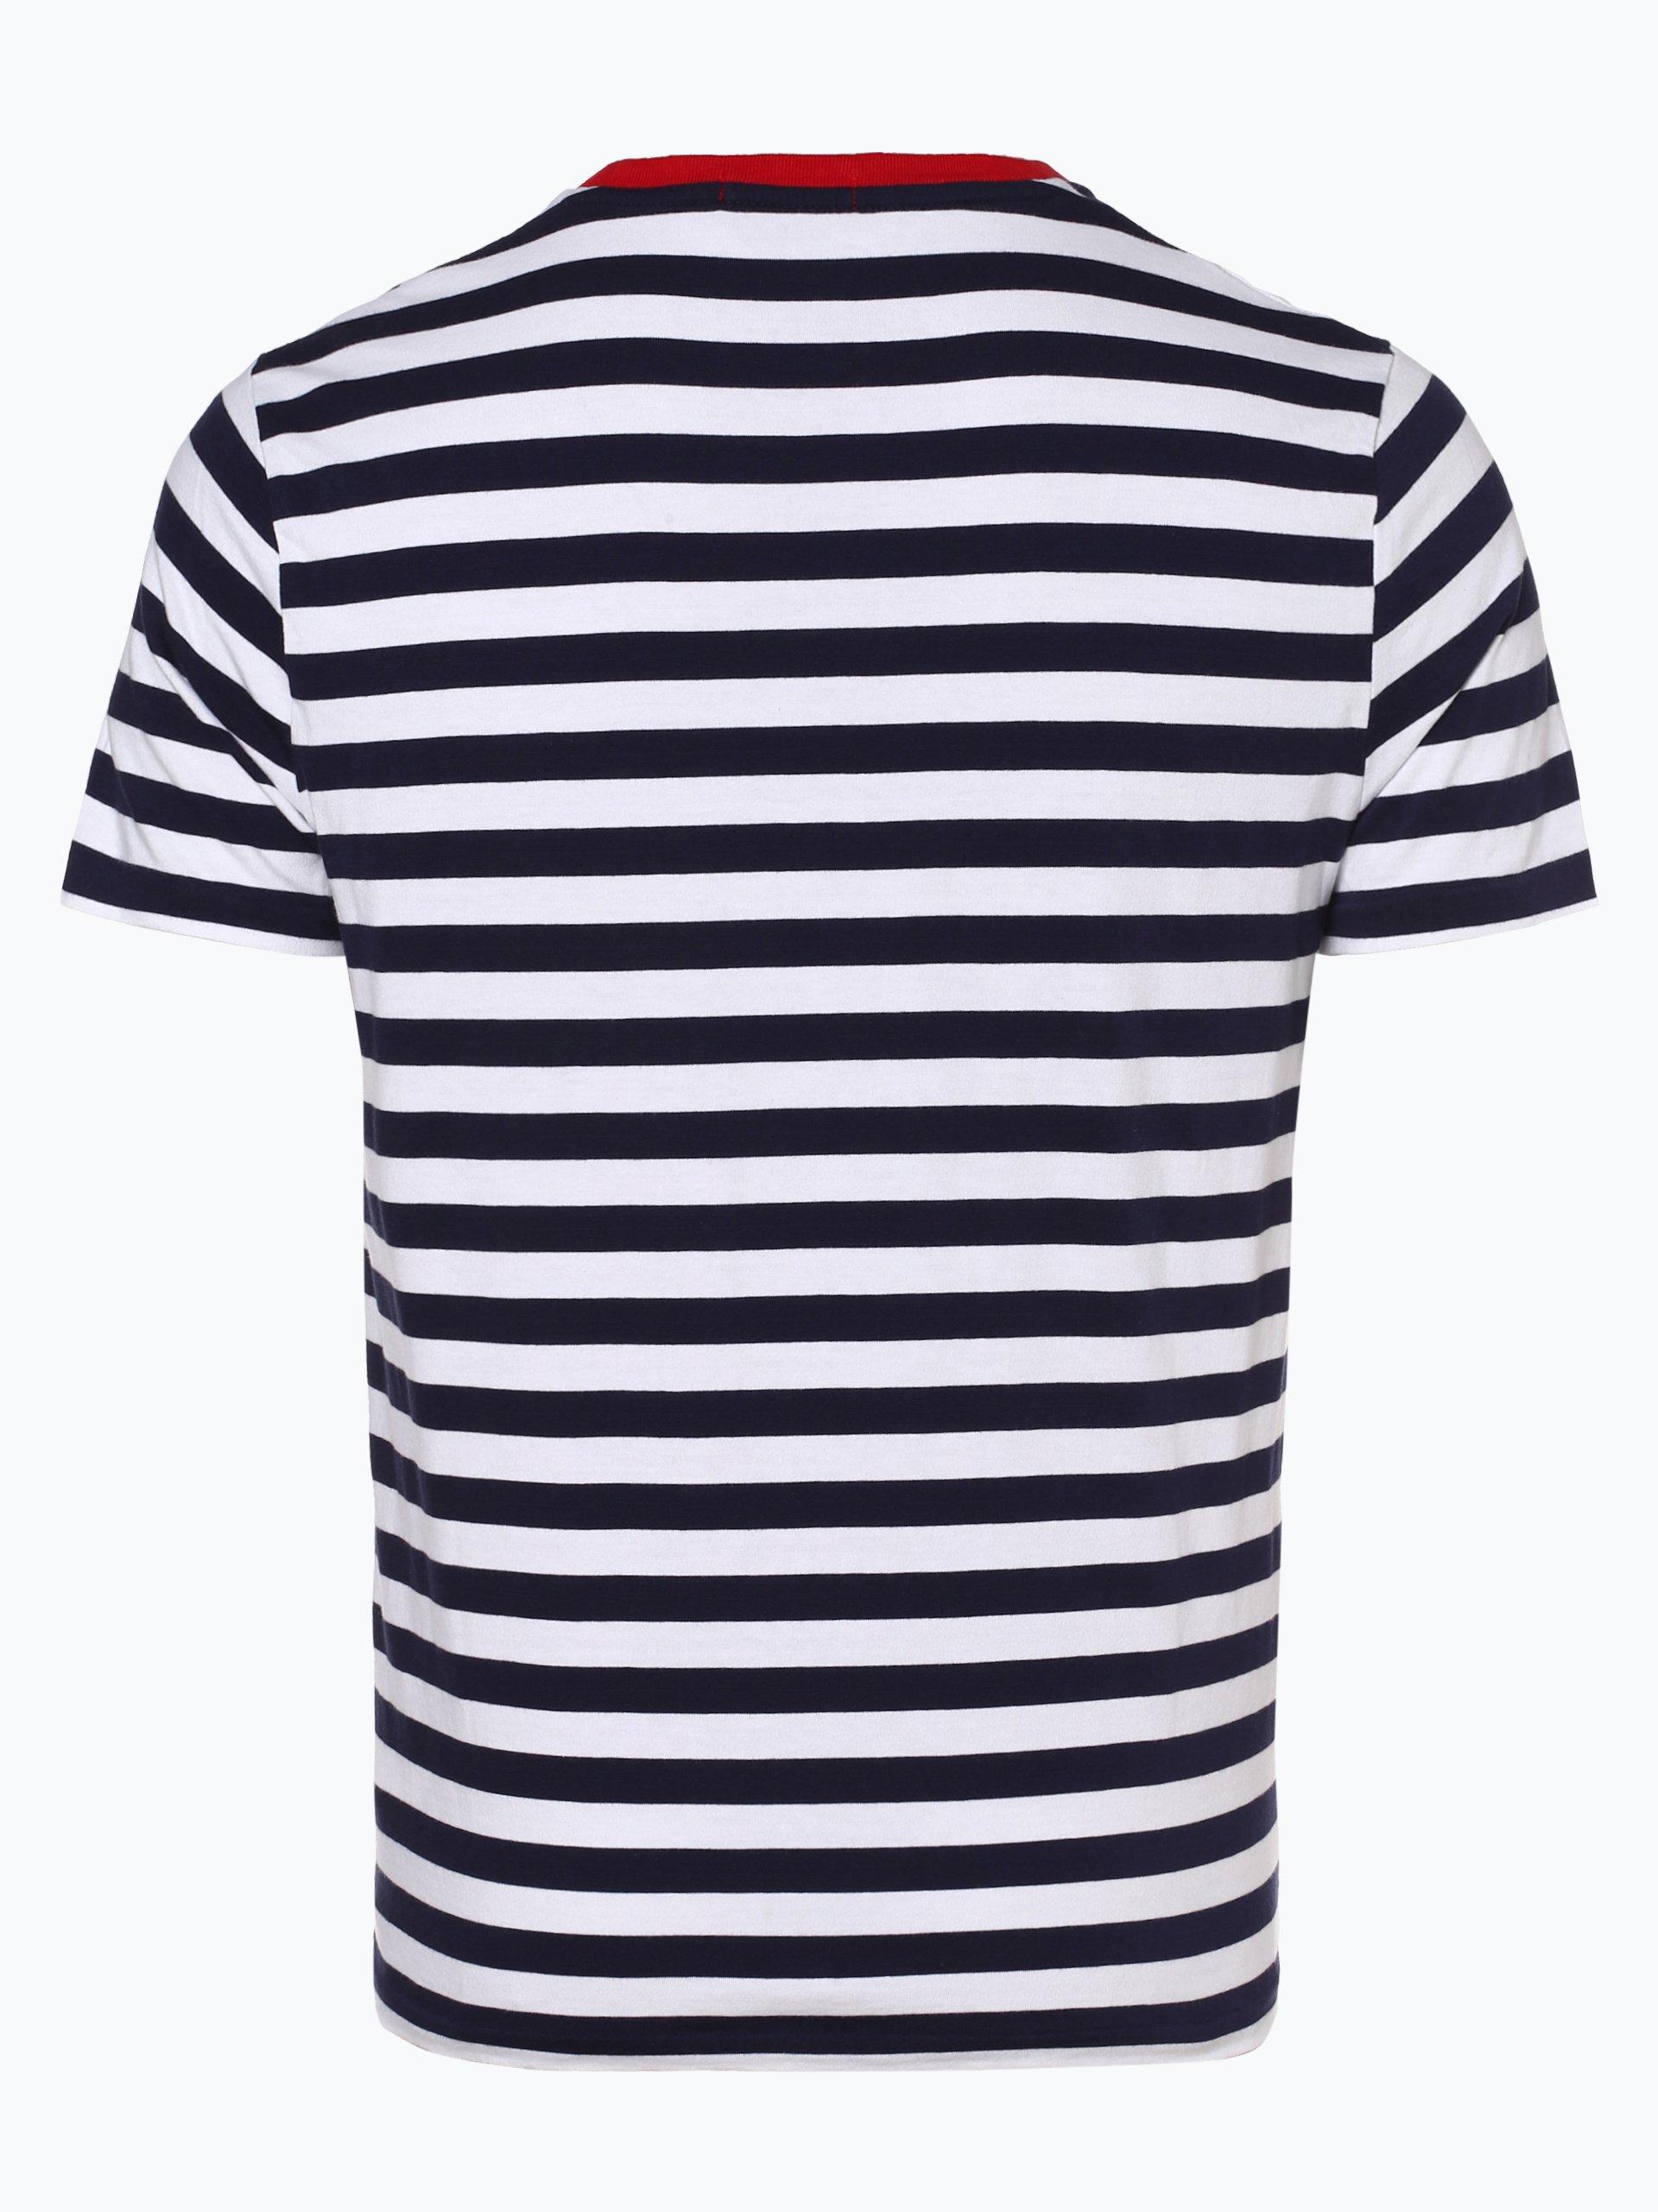 Polo Ralph Lauren Herren T-Shirt - Custom Slim Fit